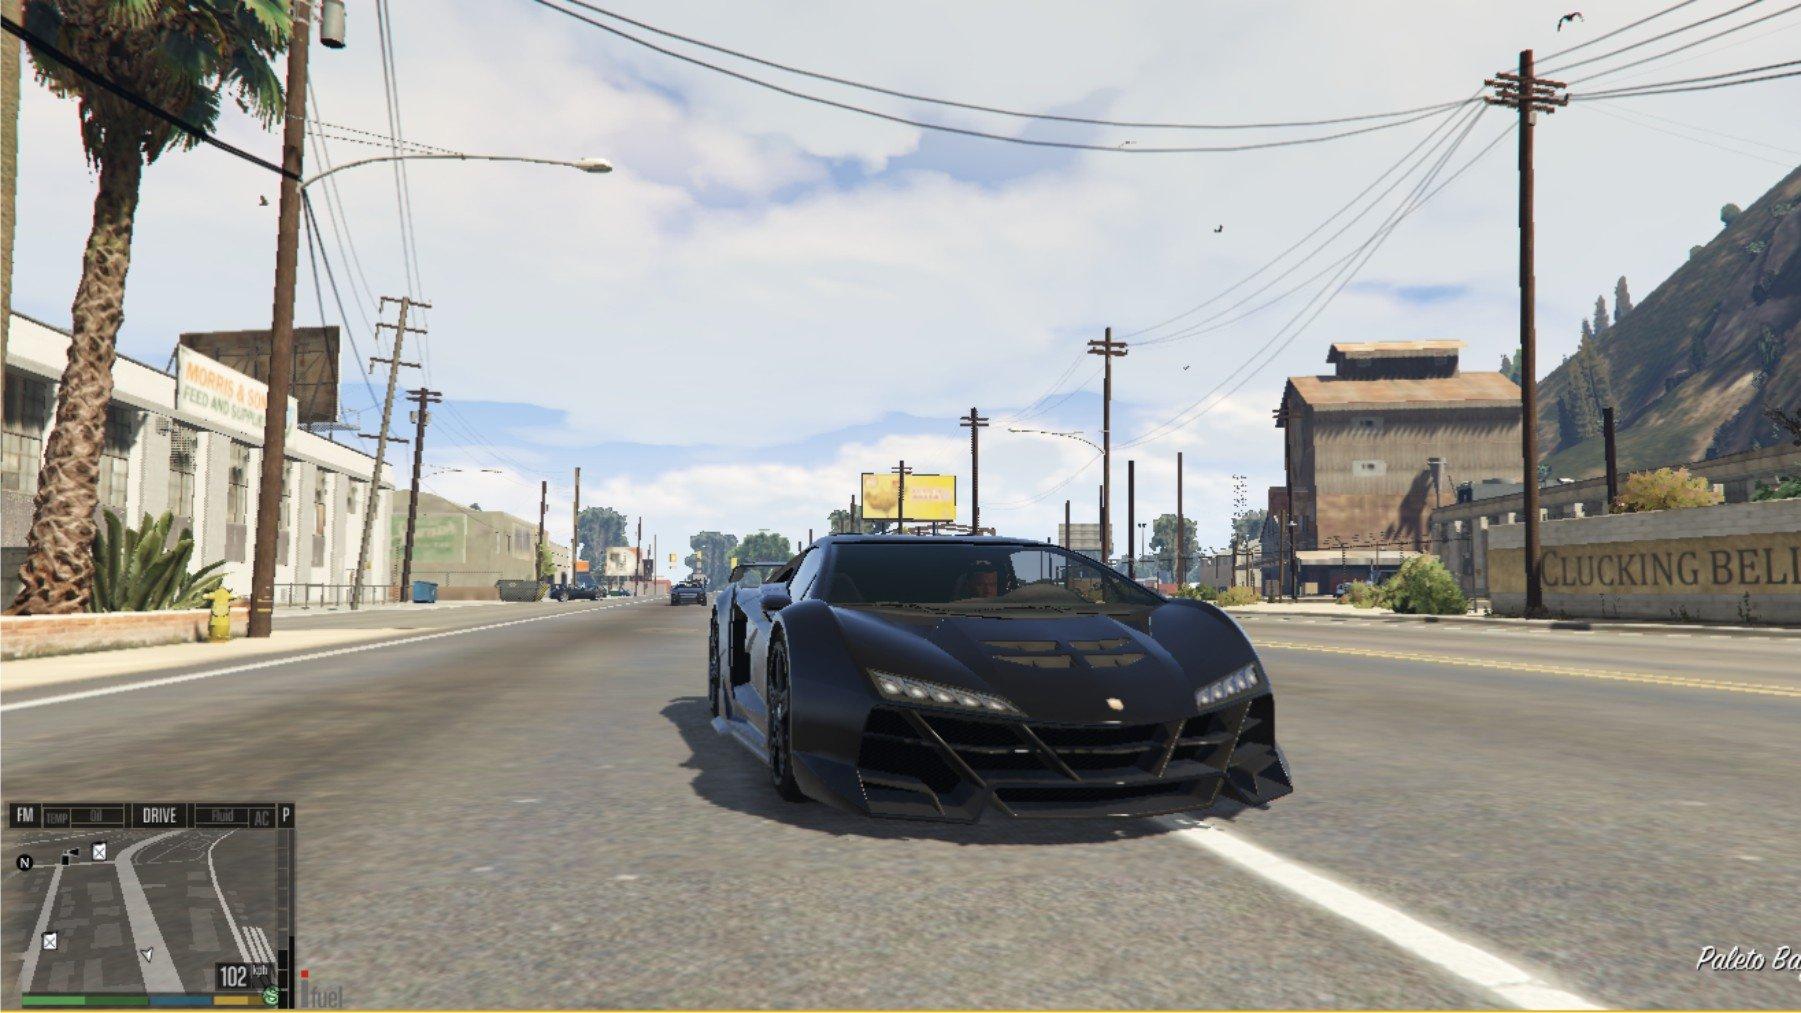 Simple Speedometer - Mods pour GTA V sur GTA Modding